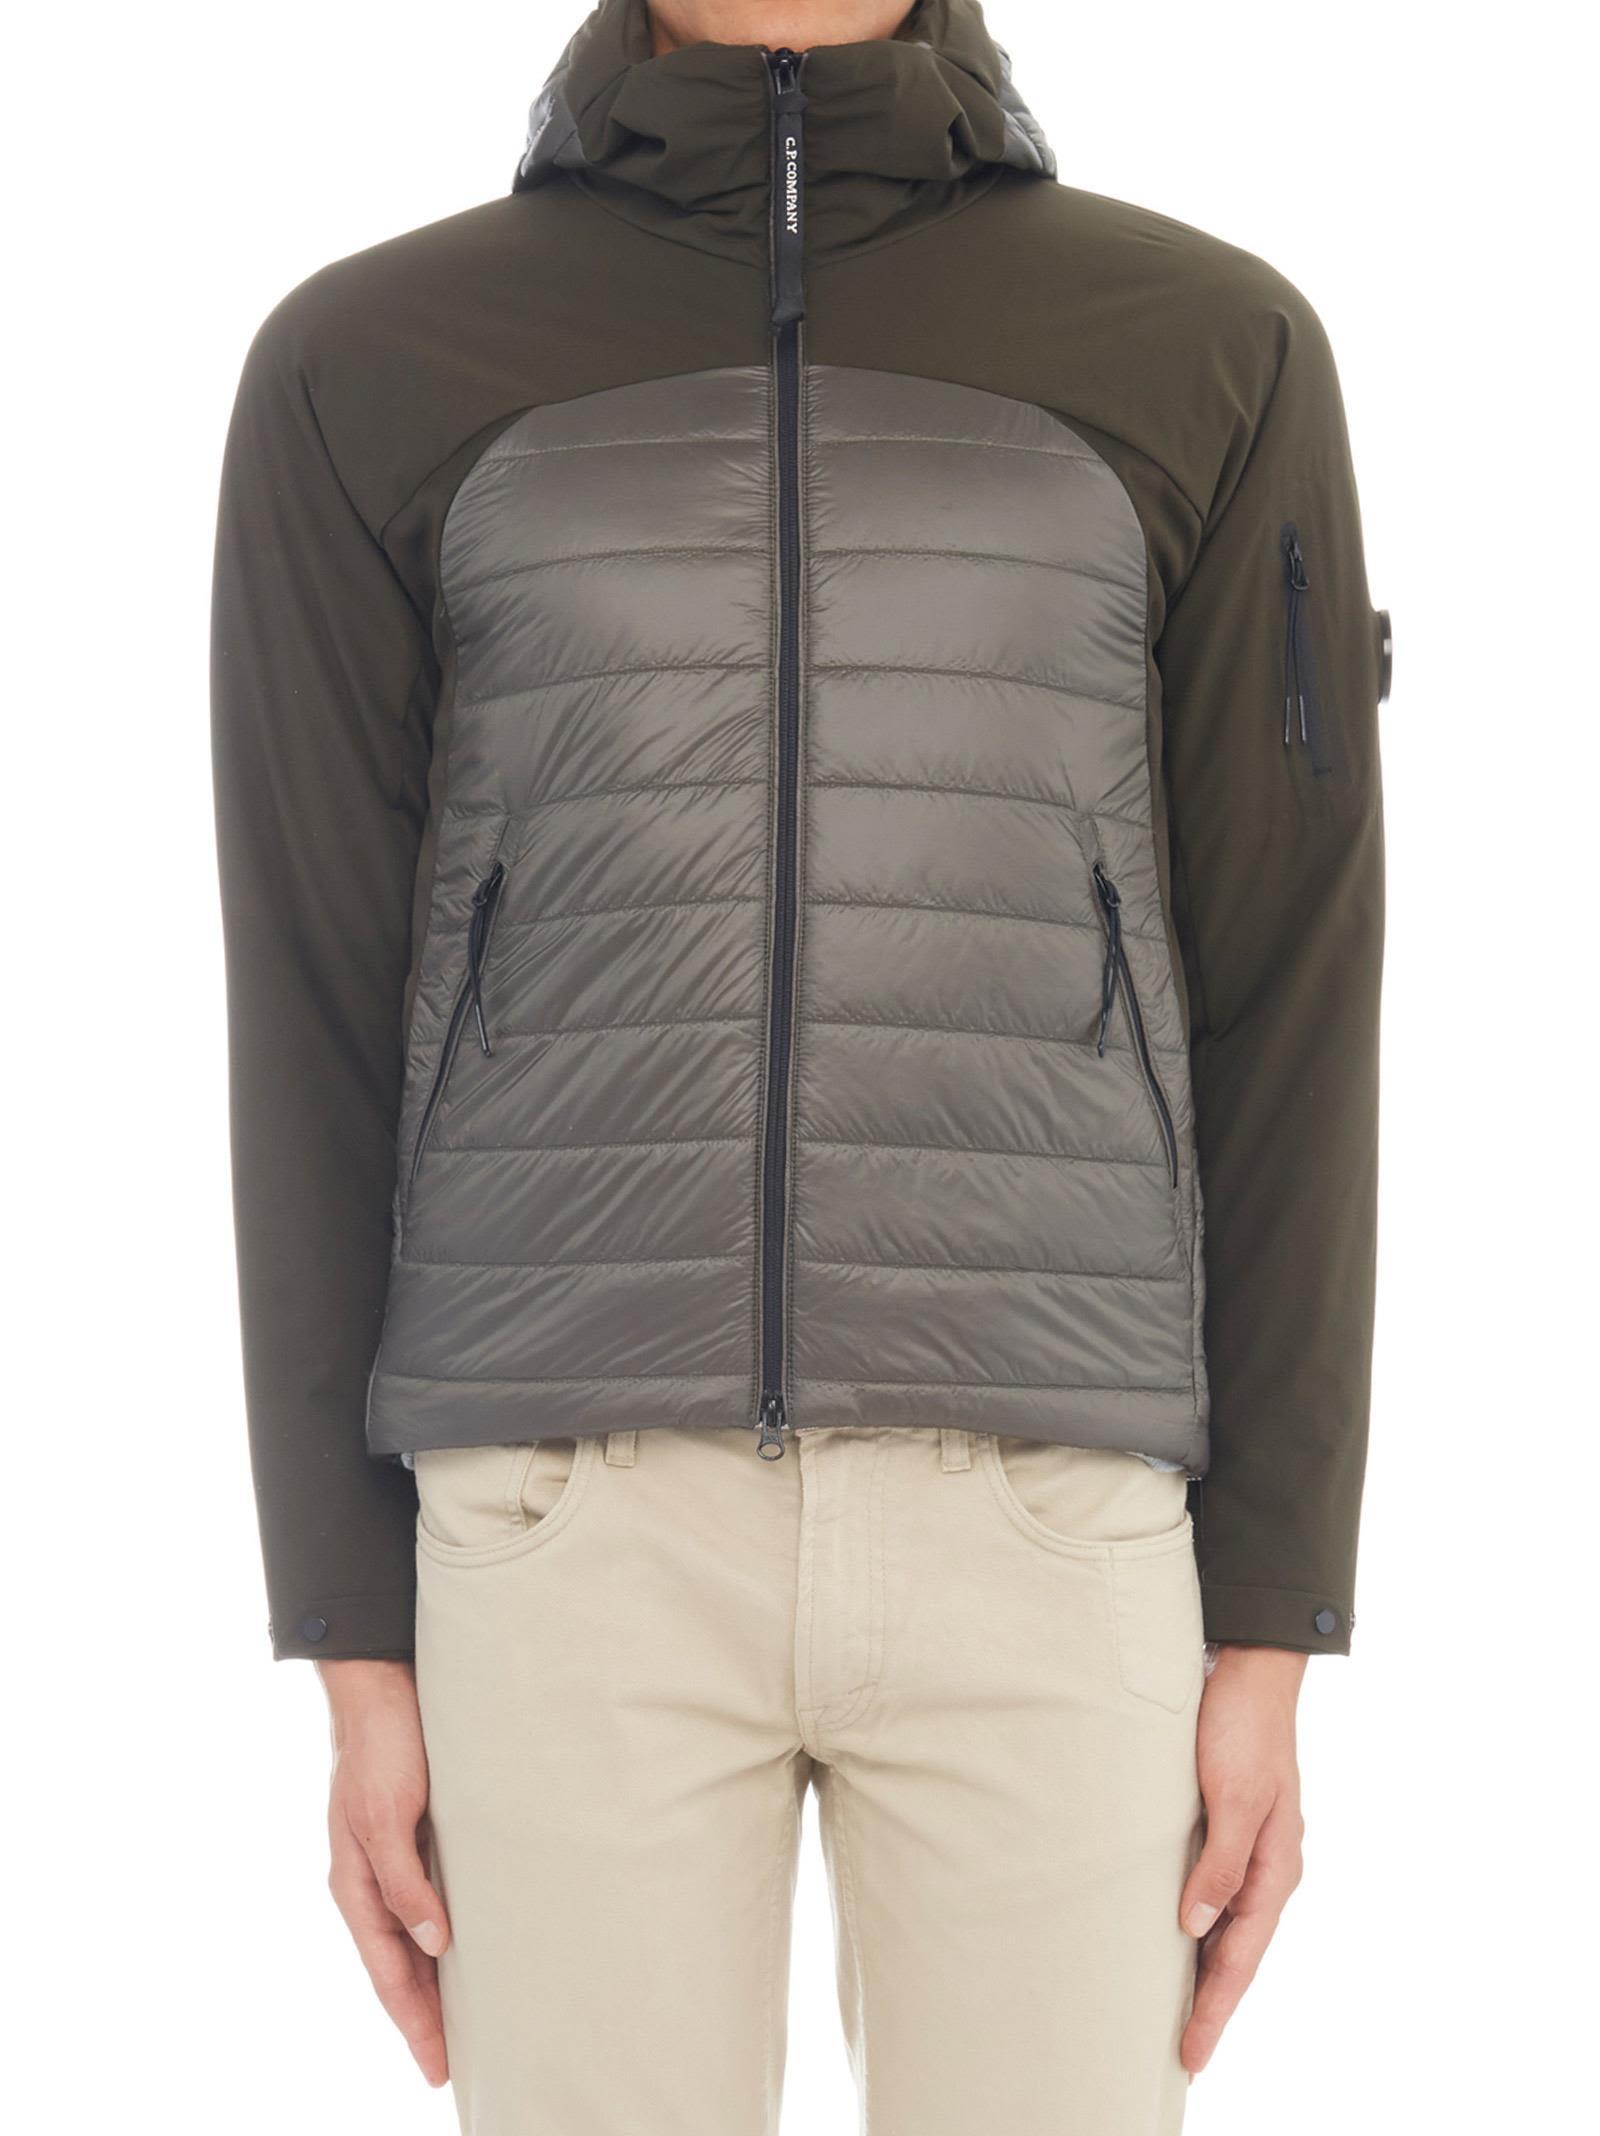 C.p. Company 'pro-tech' Jacket